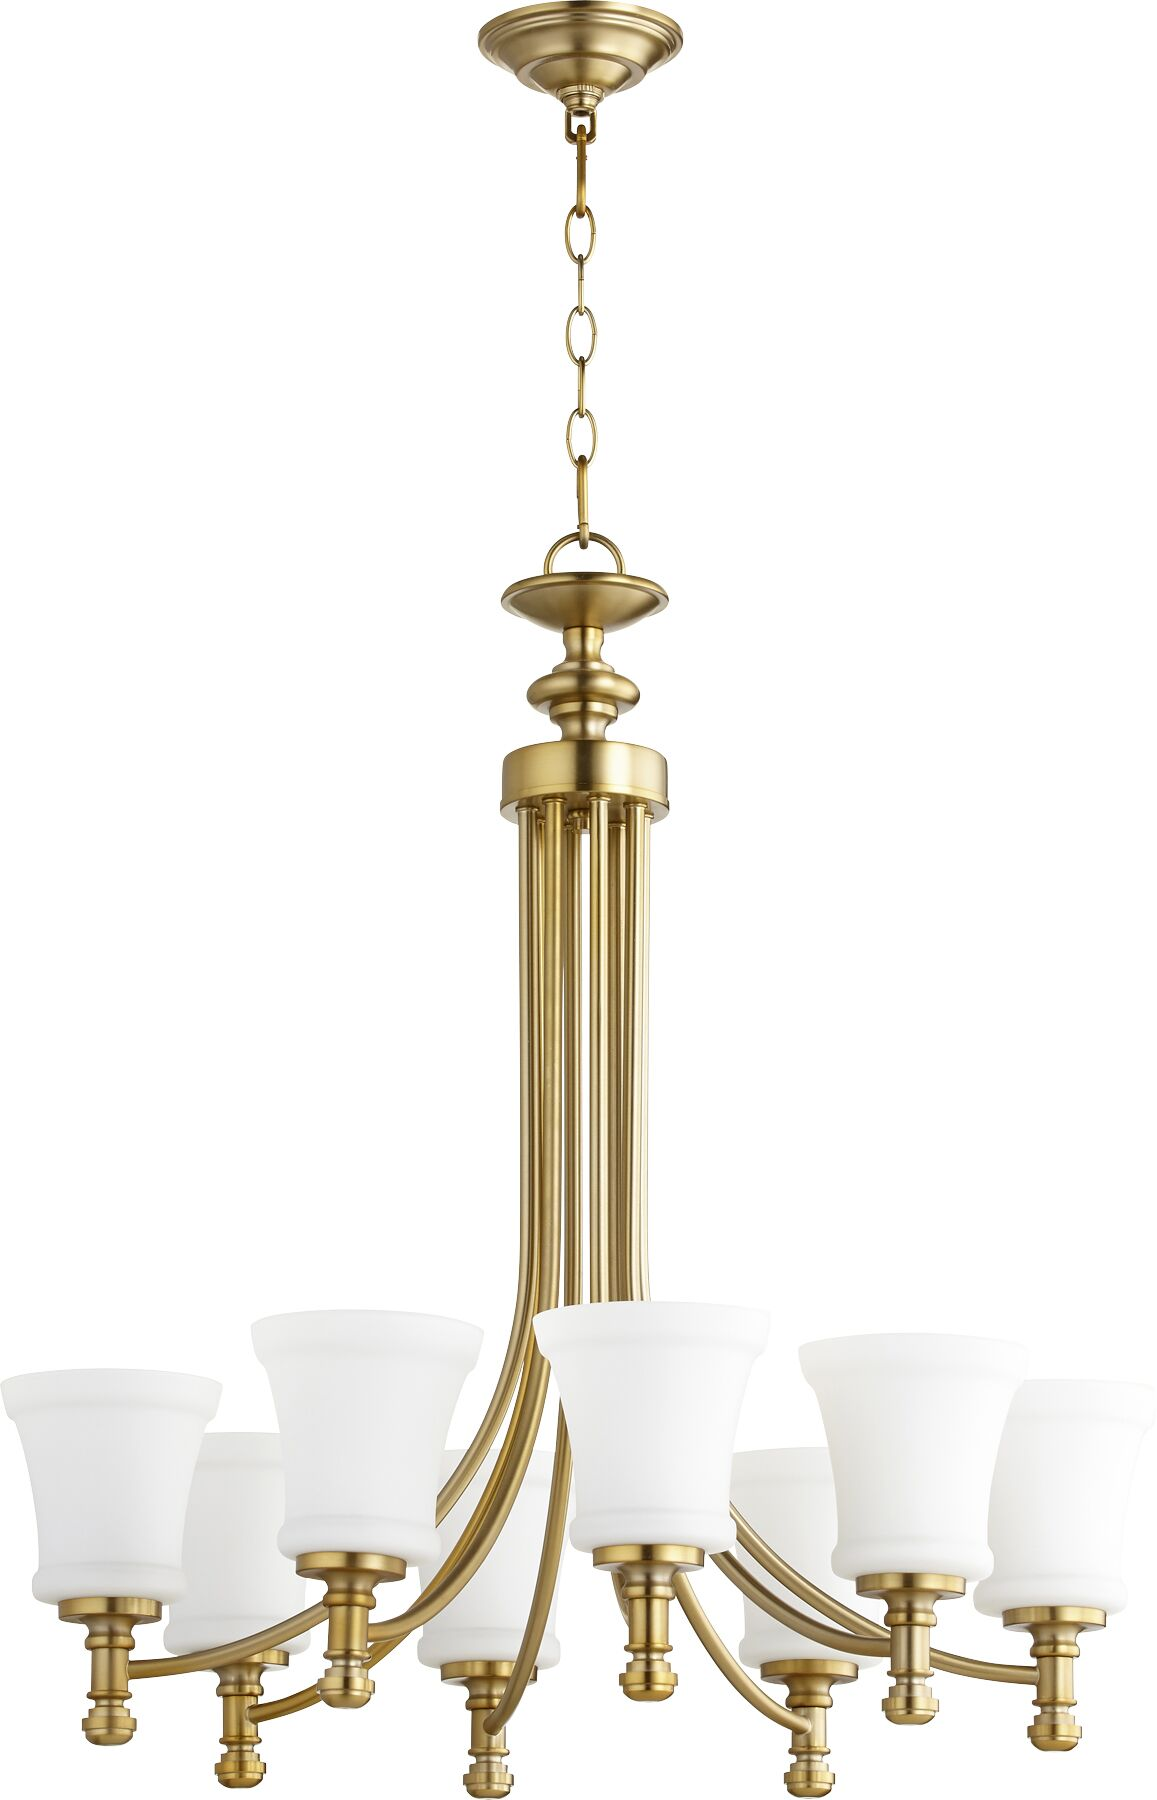 Rossington 8-Light Shaded Chandelier Finish: Aged Brass